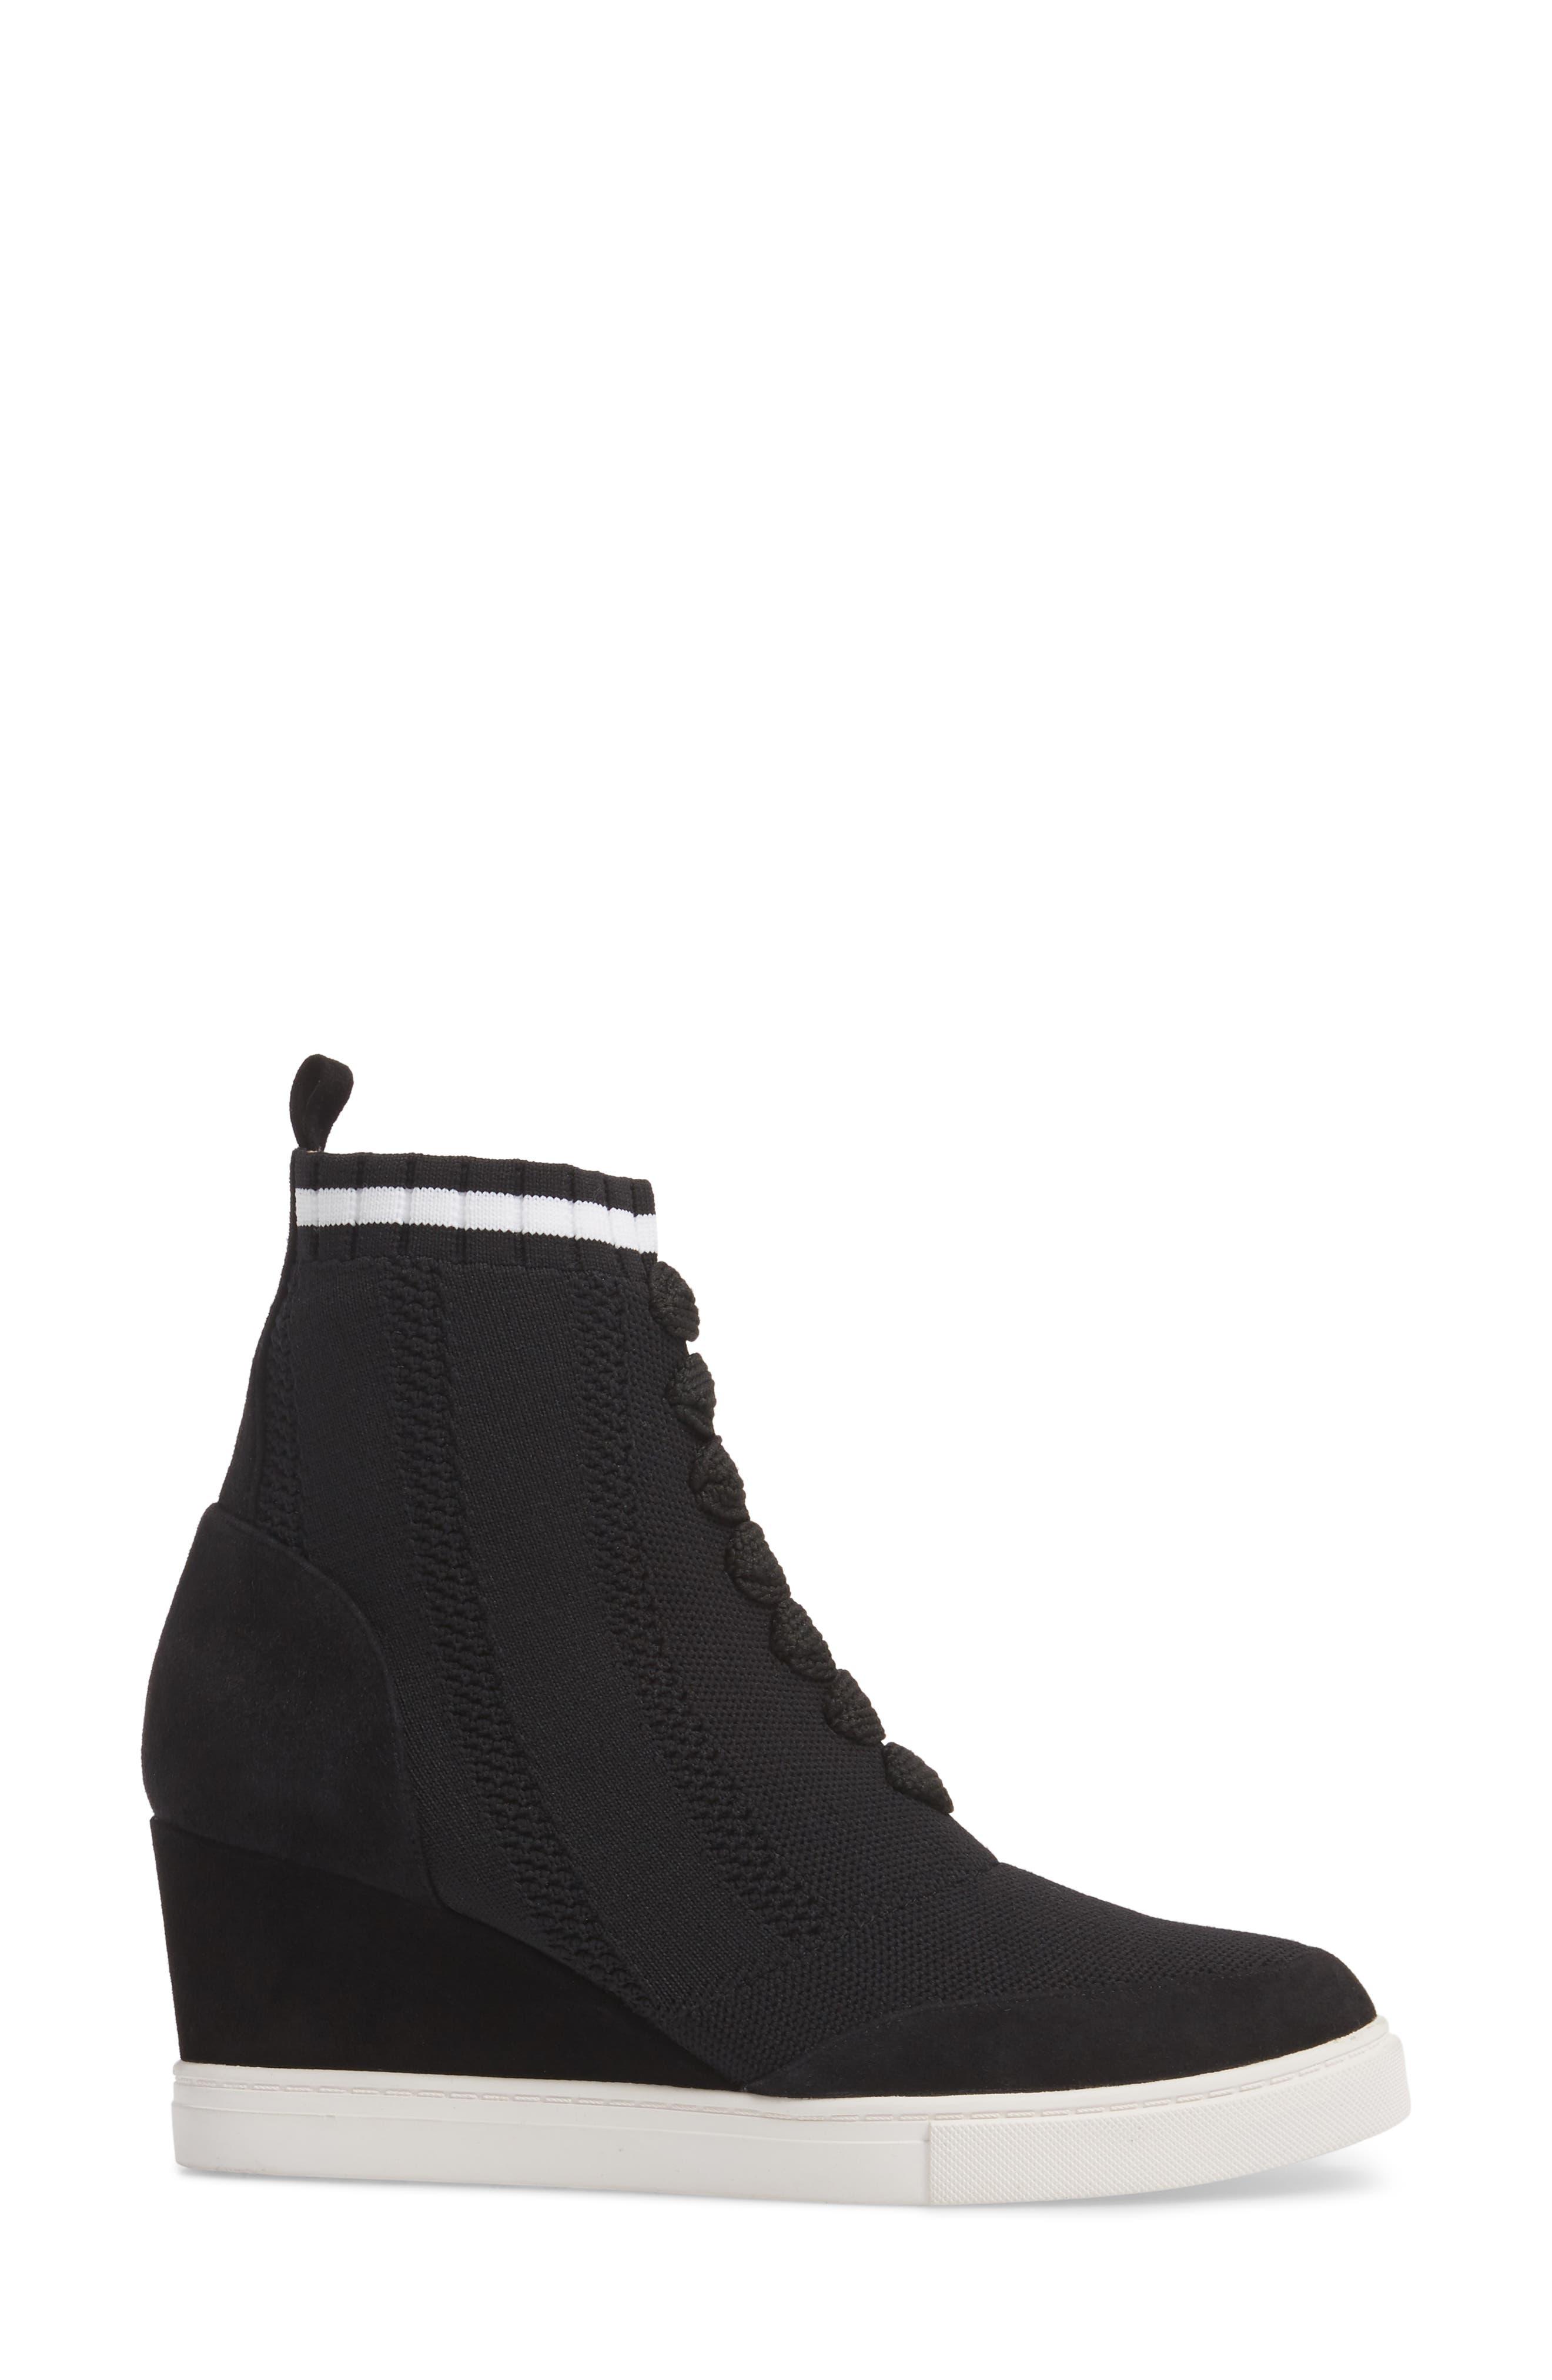 LINEA PAOLO,                             Fabiana Wedge Sneaker,                             Alternate thumbnail 3, color,                             BLACK SUEDE